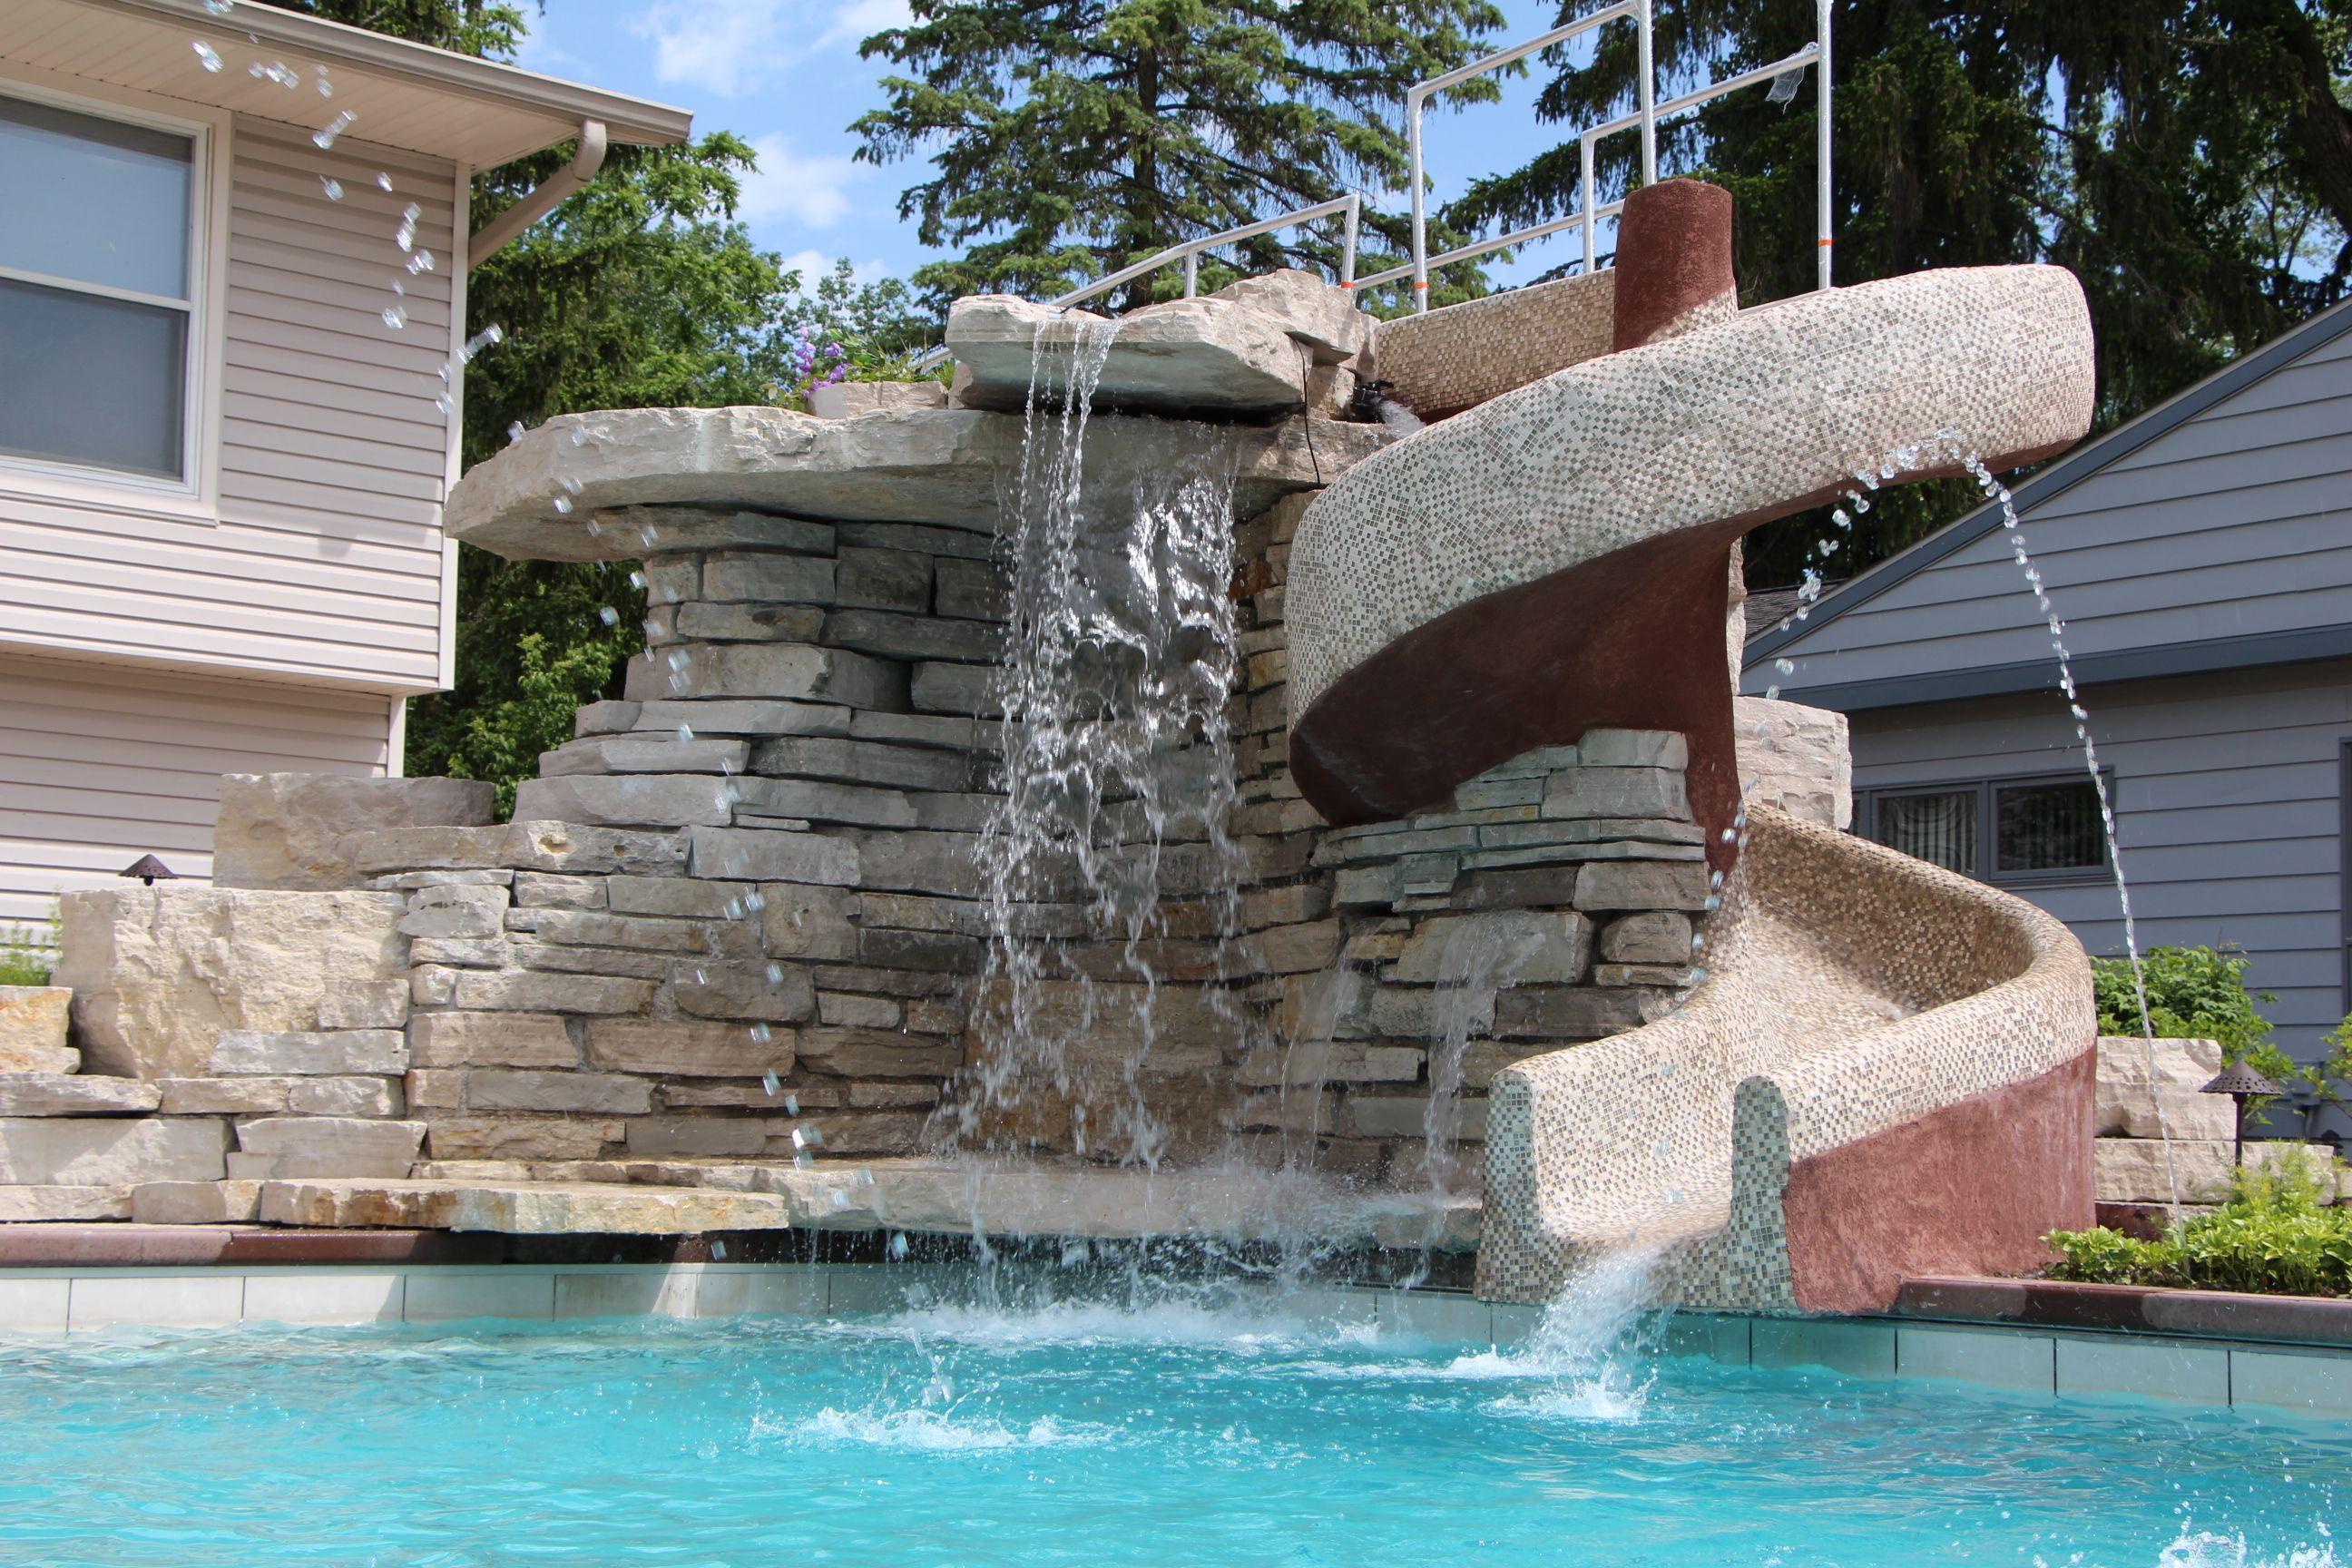 Custom Waterfall And Slide   Quantus Pools Quantuspools.com 847 907 4995